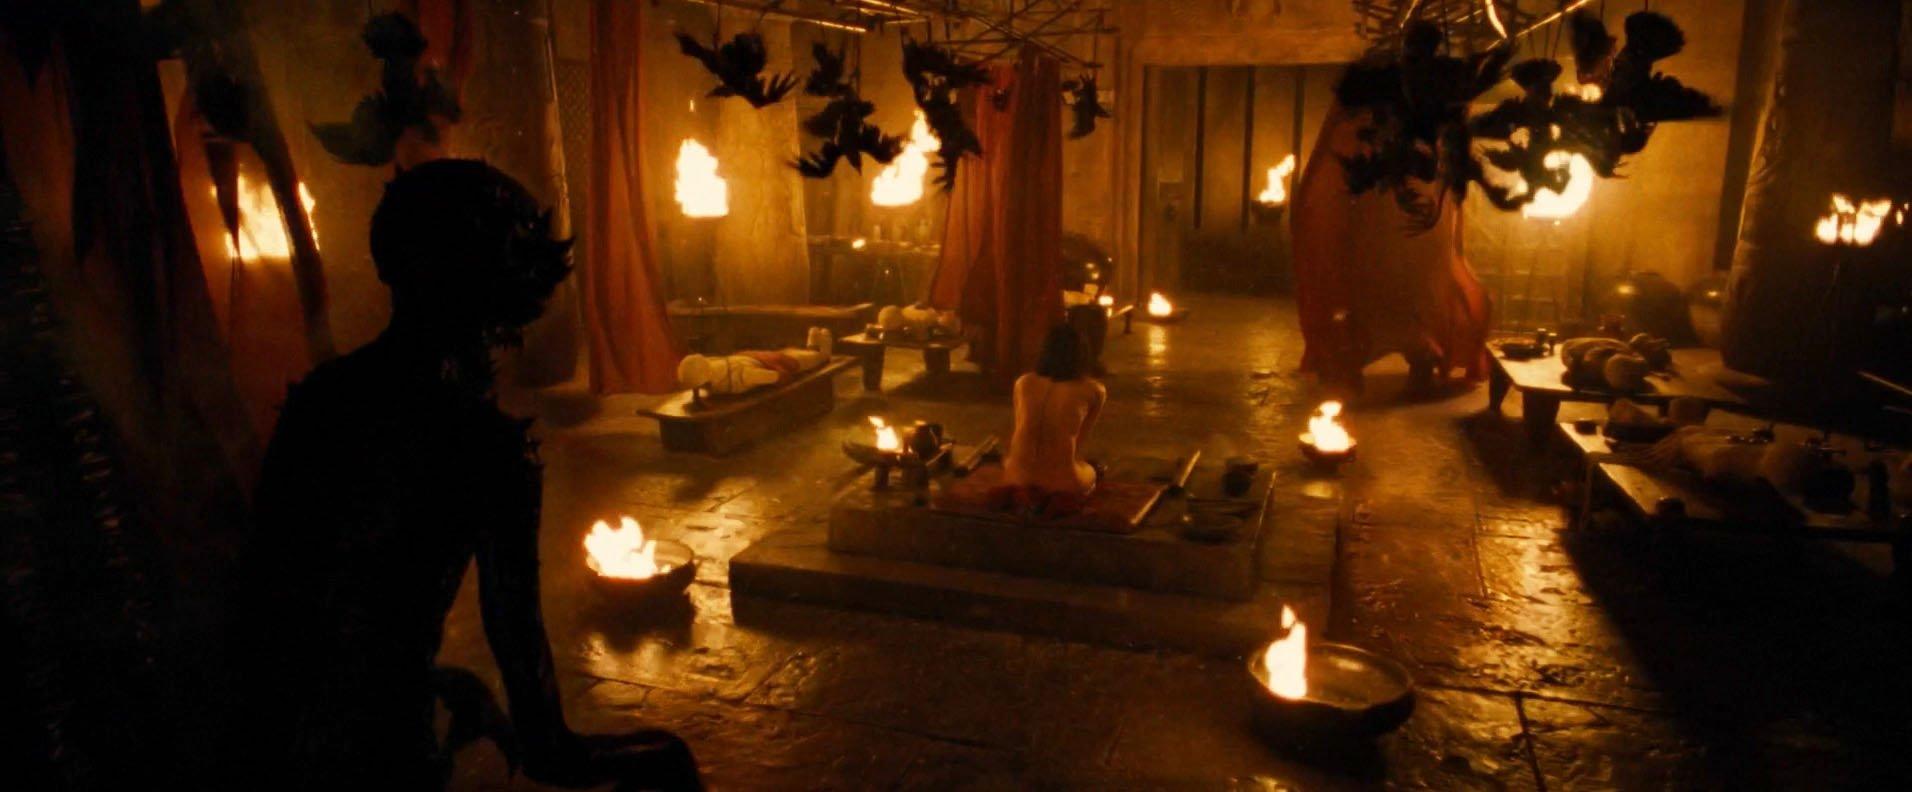 Sofia Boutella nude - The Mummy (2017)